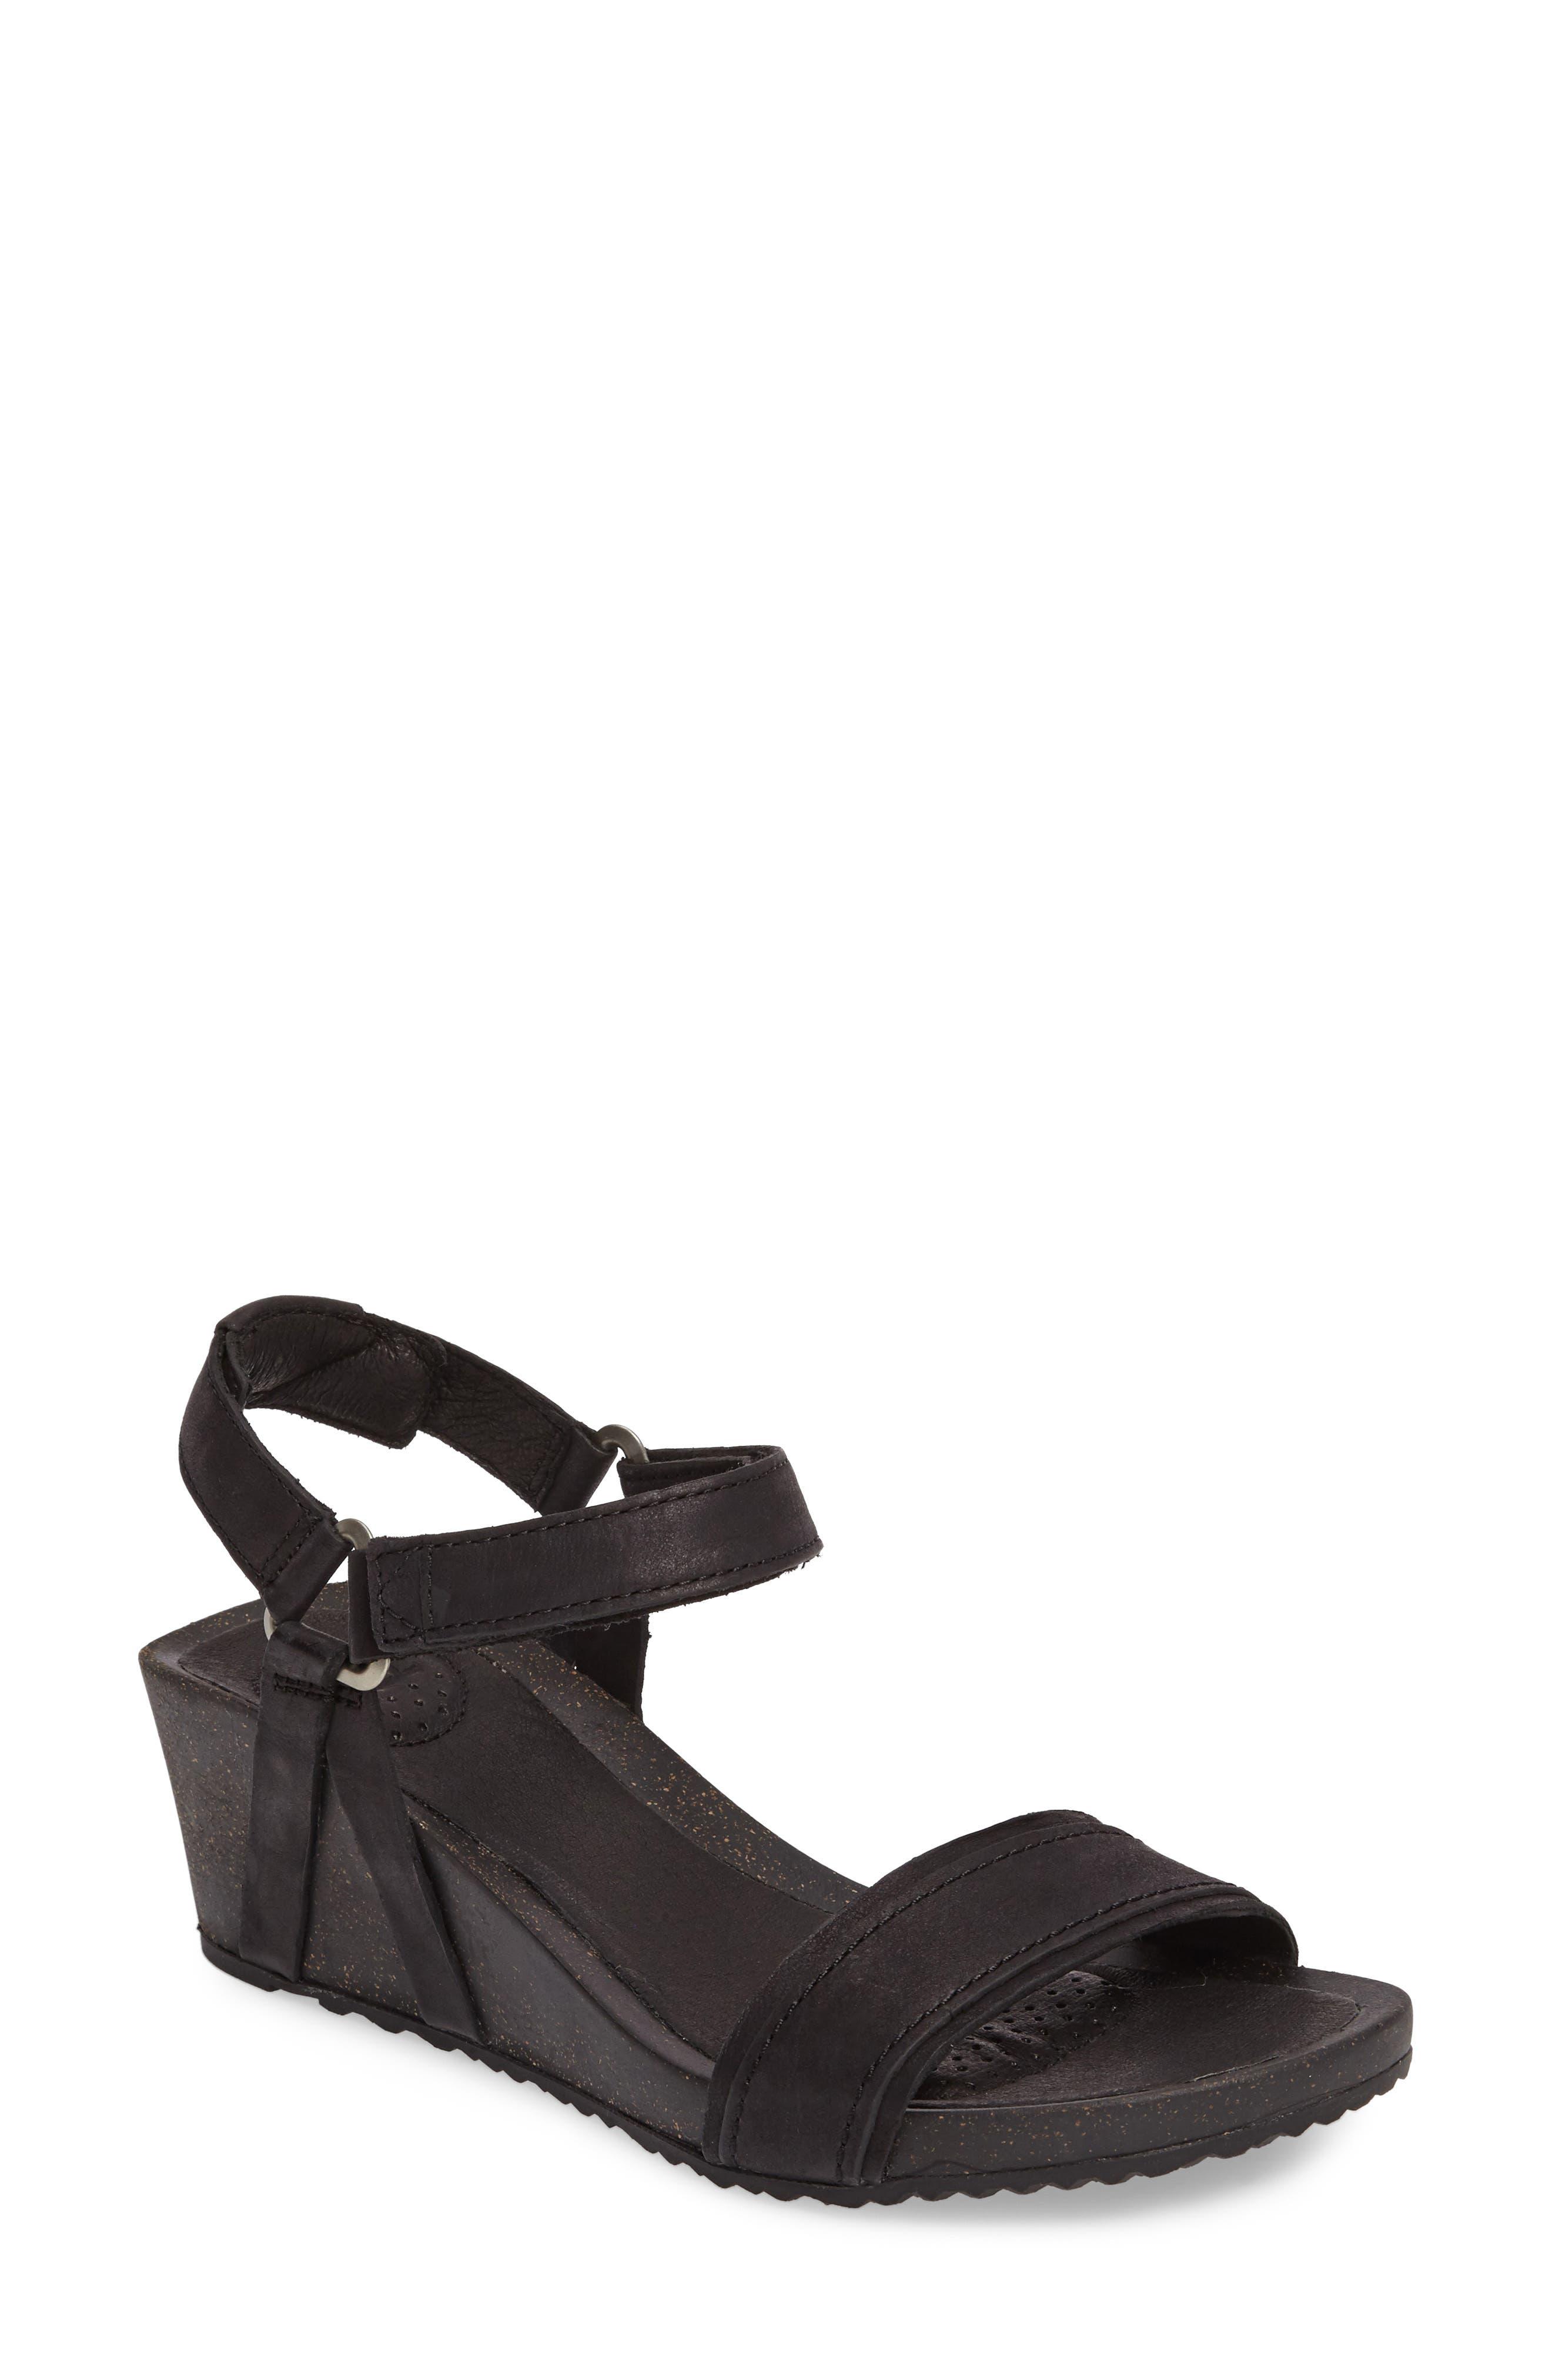 Ysidro Stitch Wedge Sandal,                             Main thumbnail 1, color,                             Black Leather